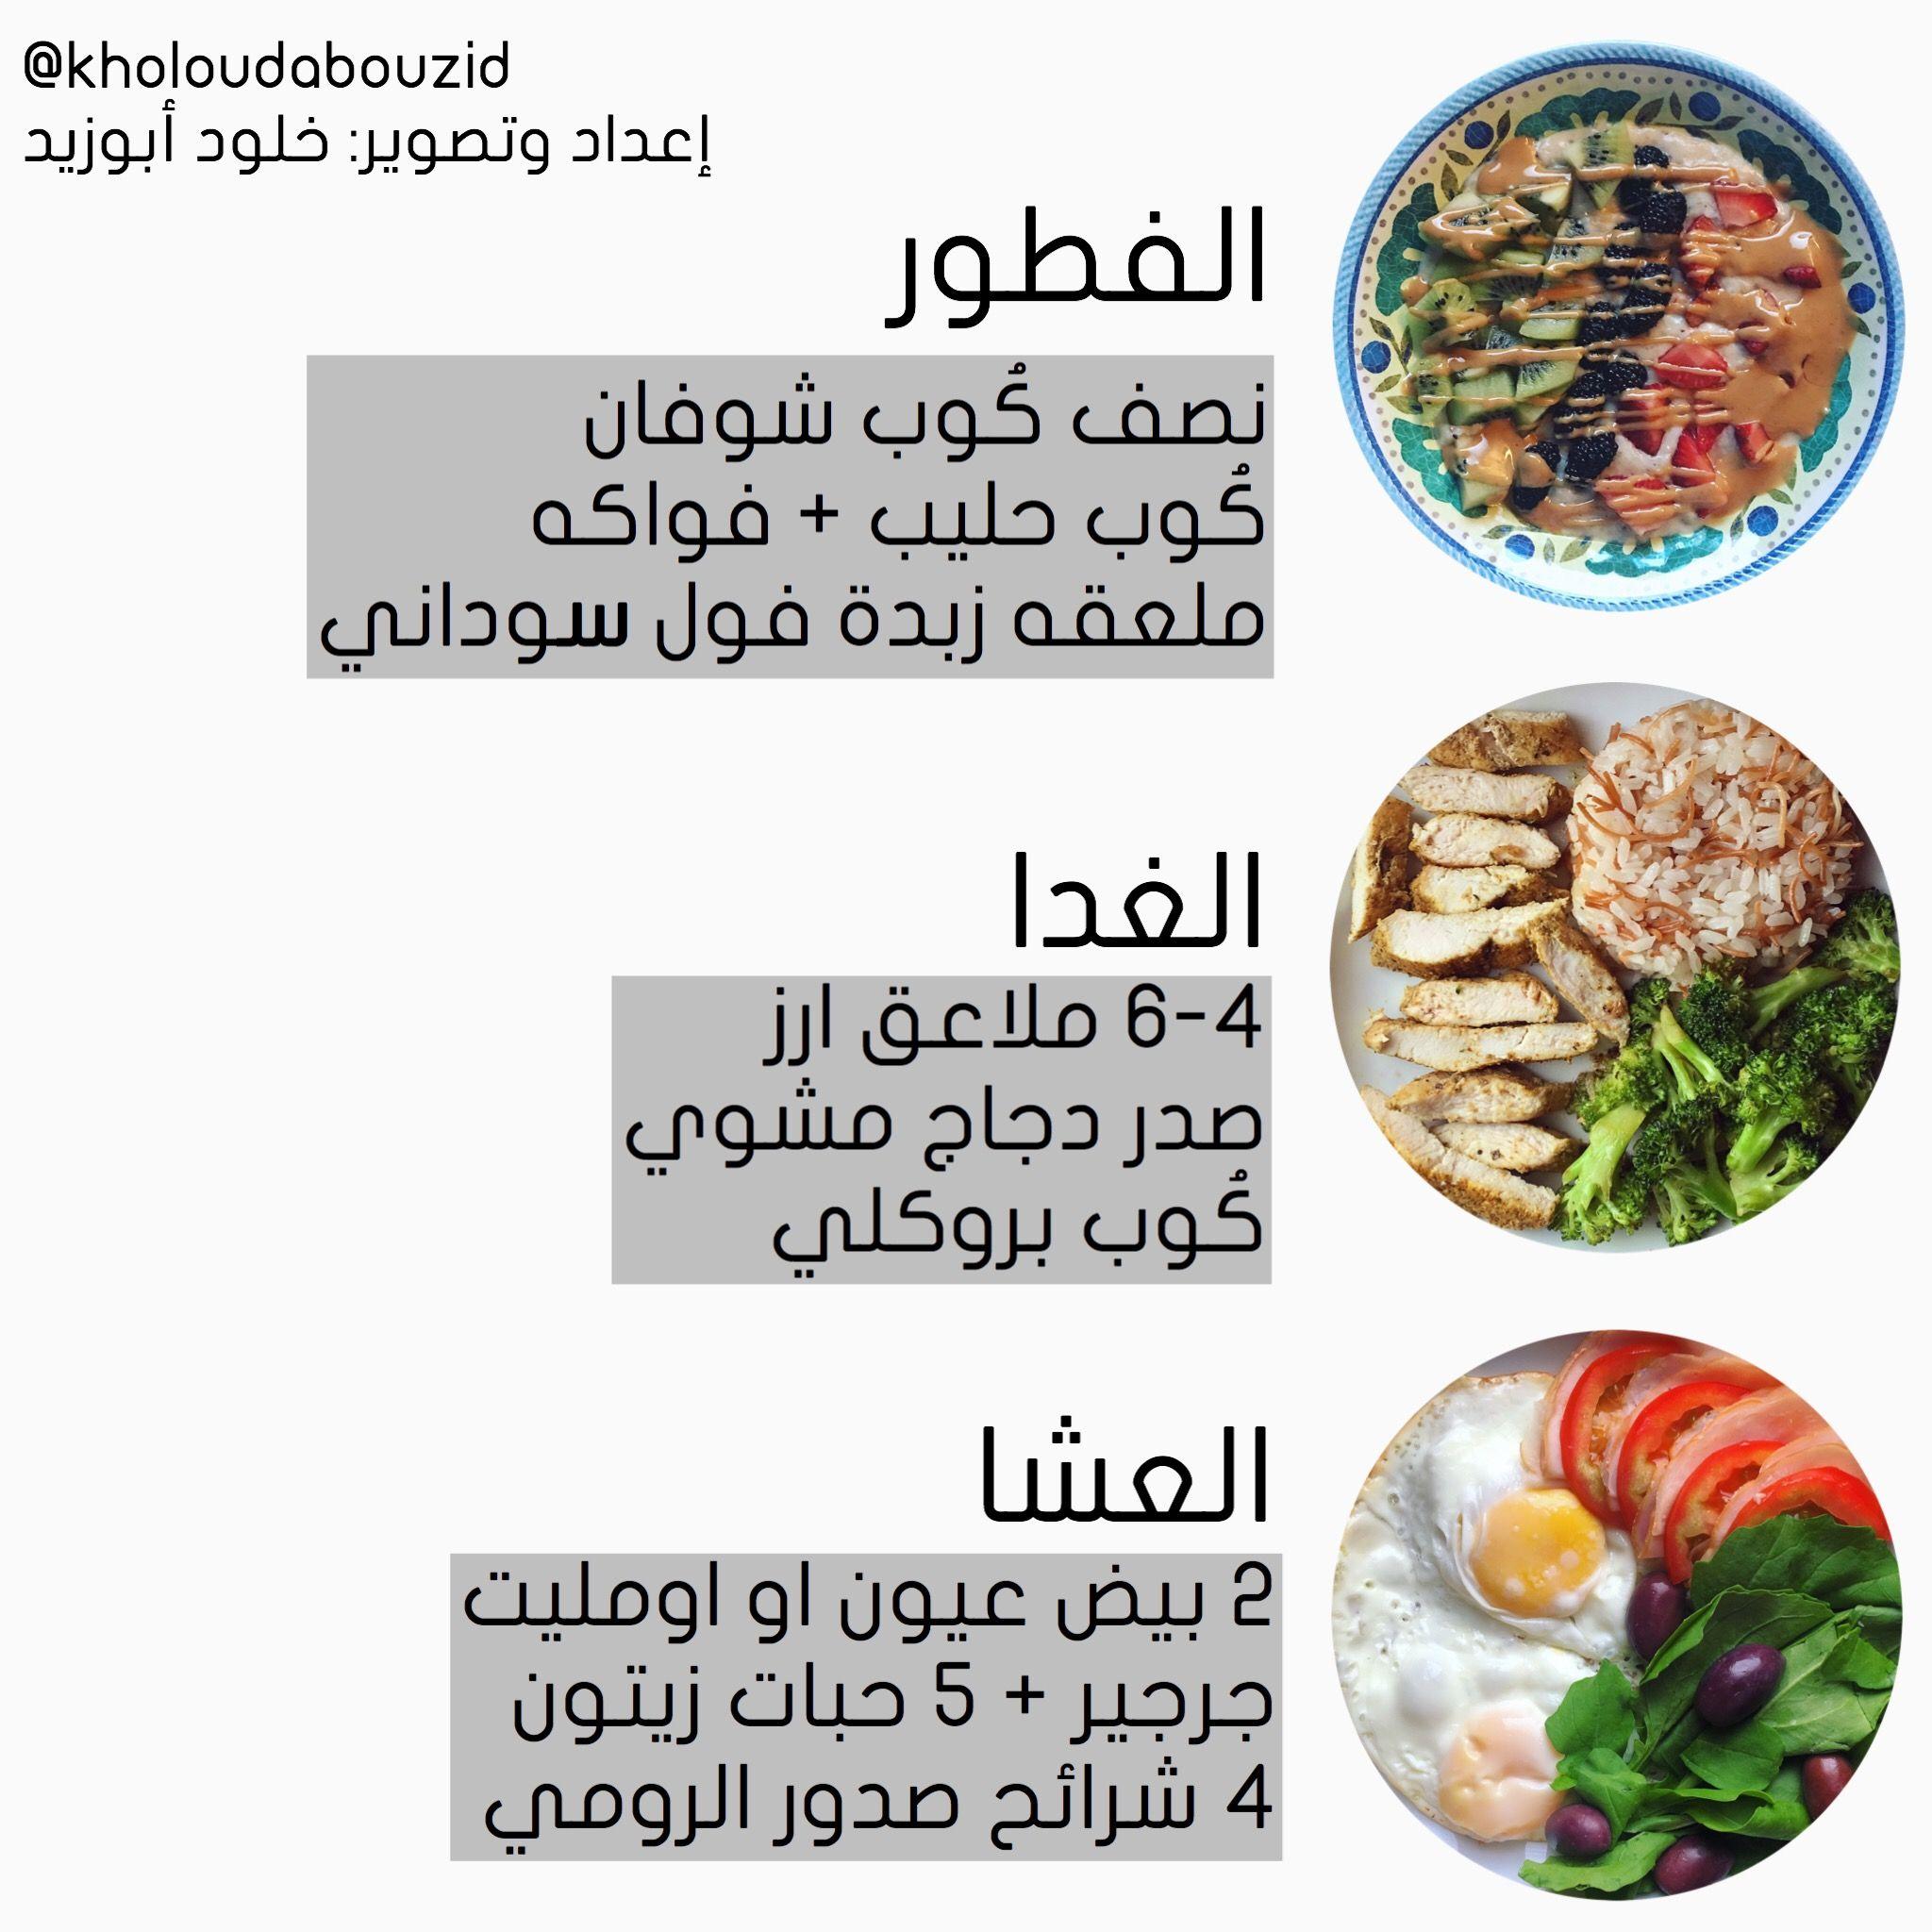 نظام دايت صحي ١٤٠٠ سعر حراري خلود ابوزيد Health Facts Food Health Fitness Food Workout Food